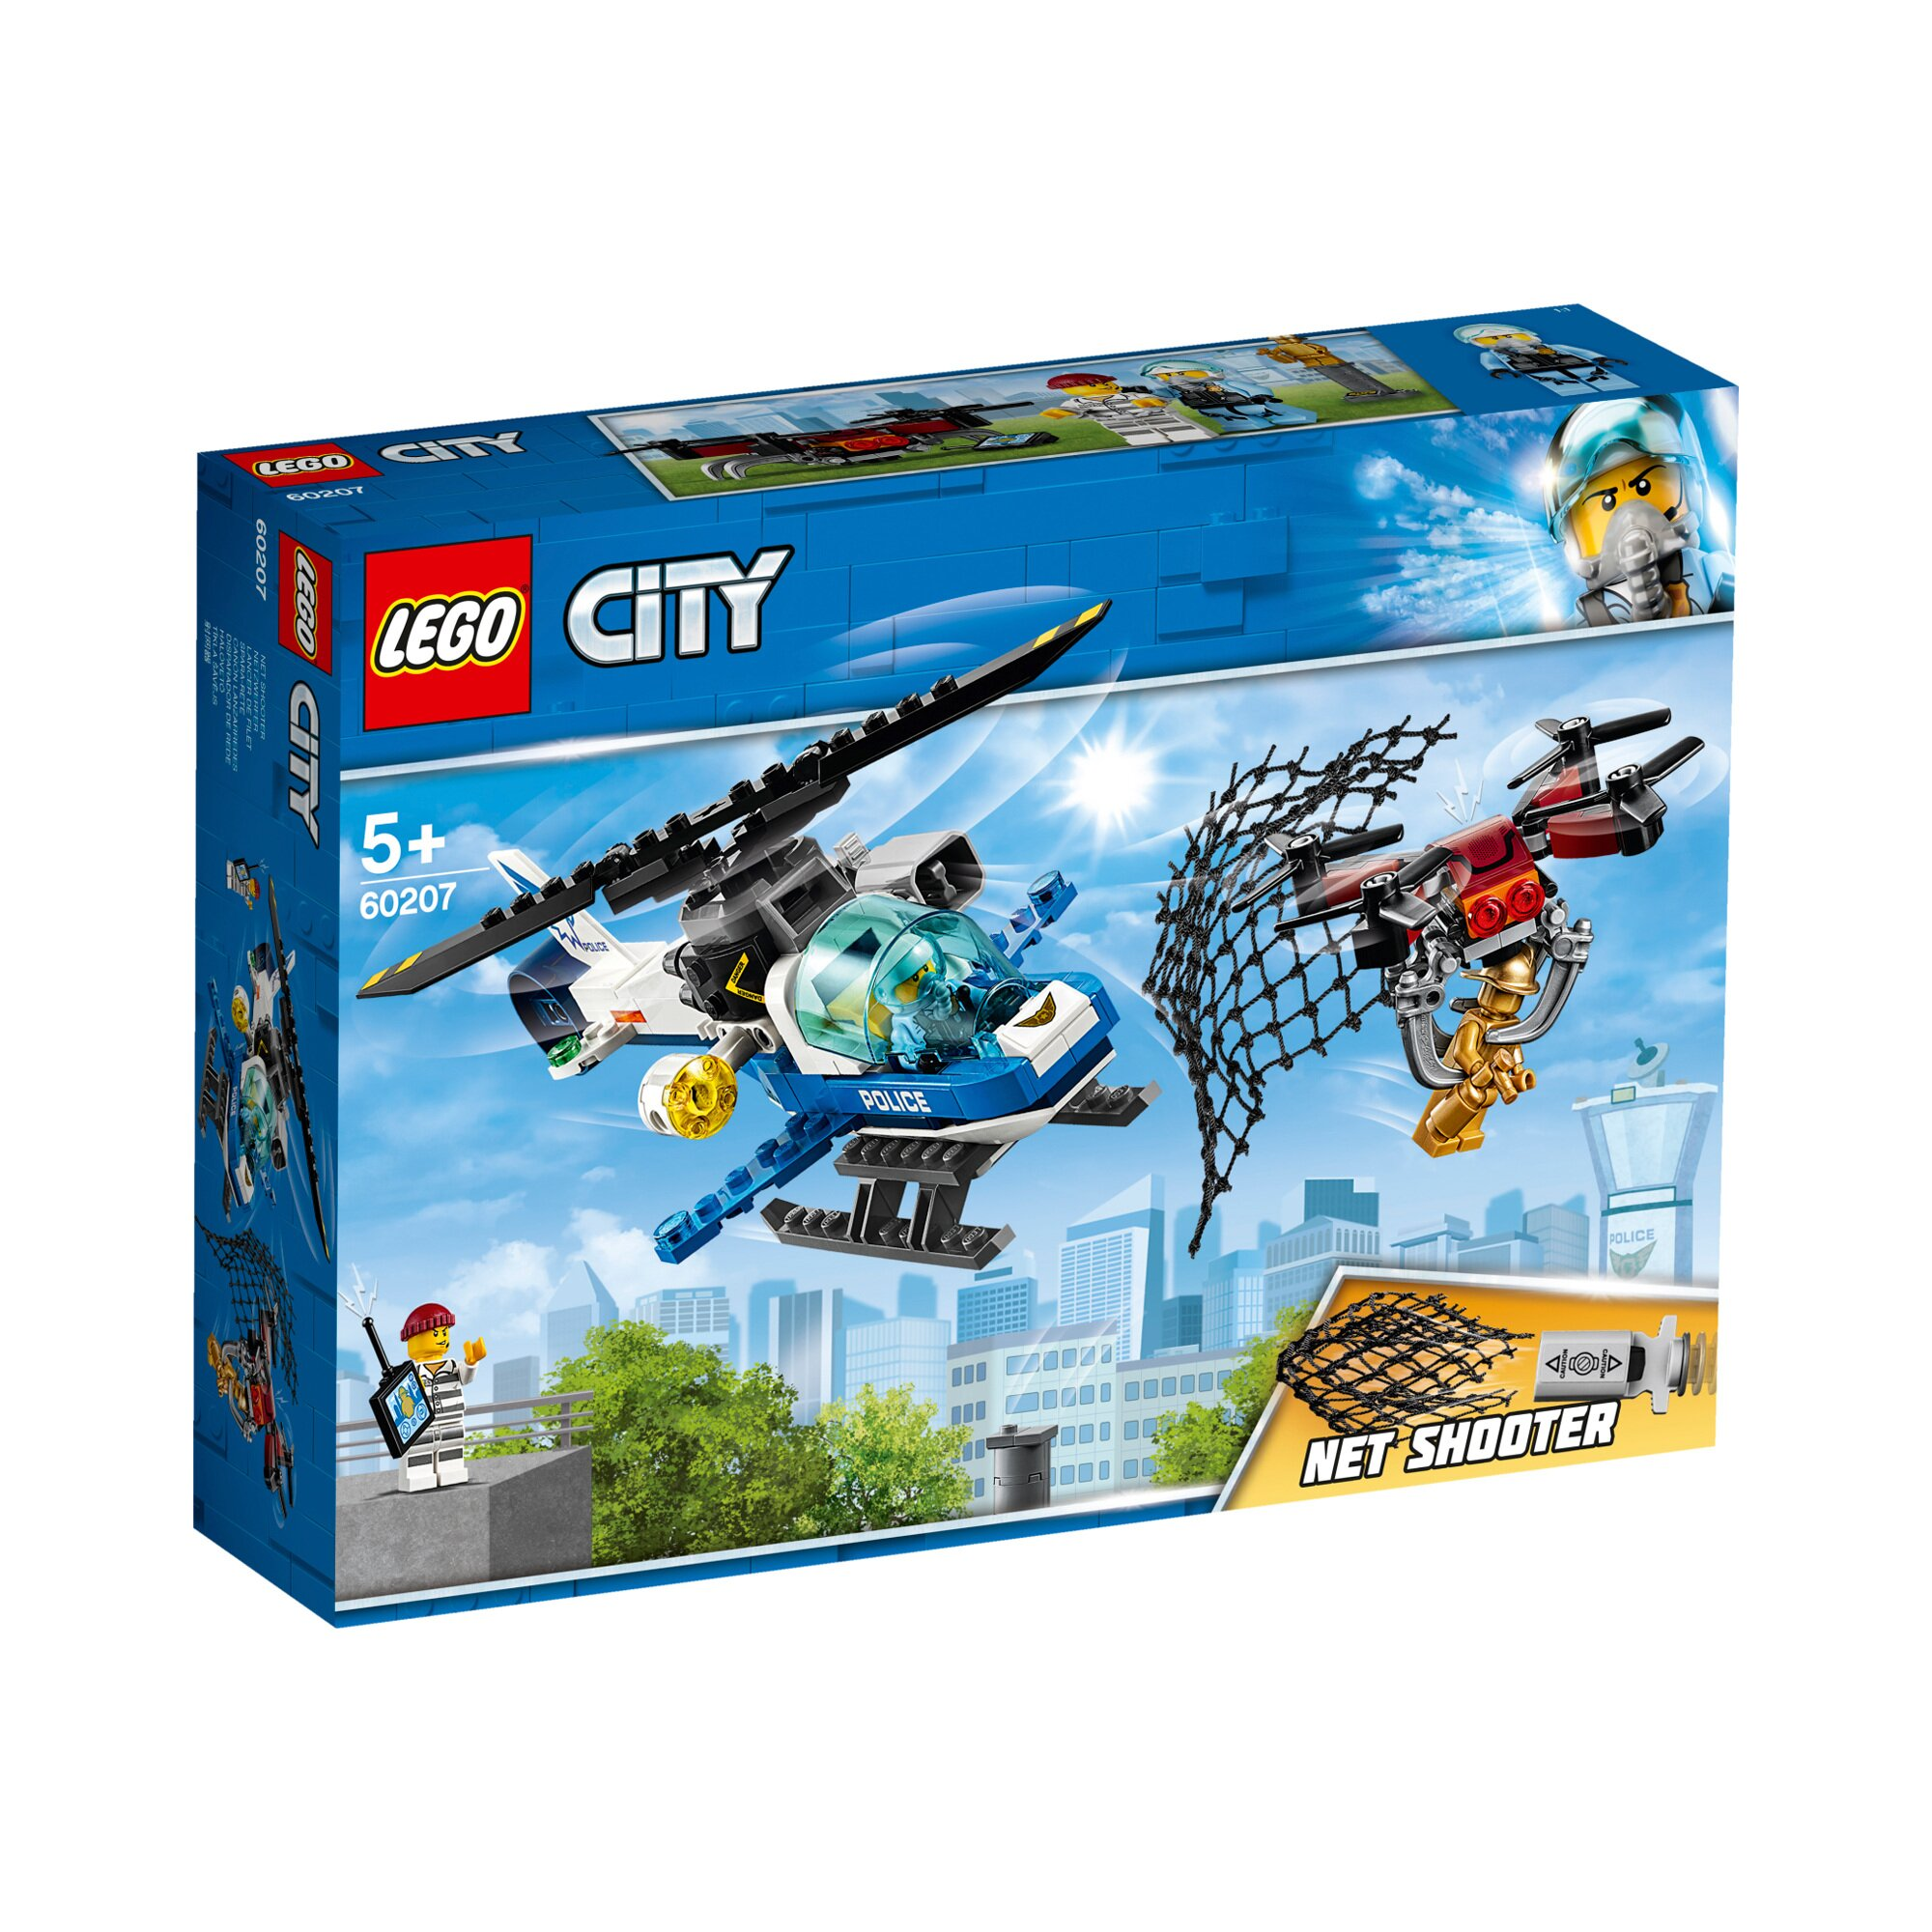 City 60207 Polizei Drohnenjagd